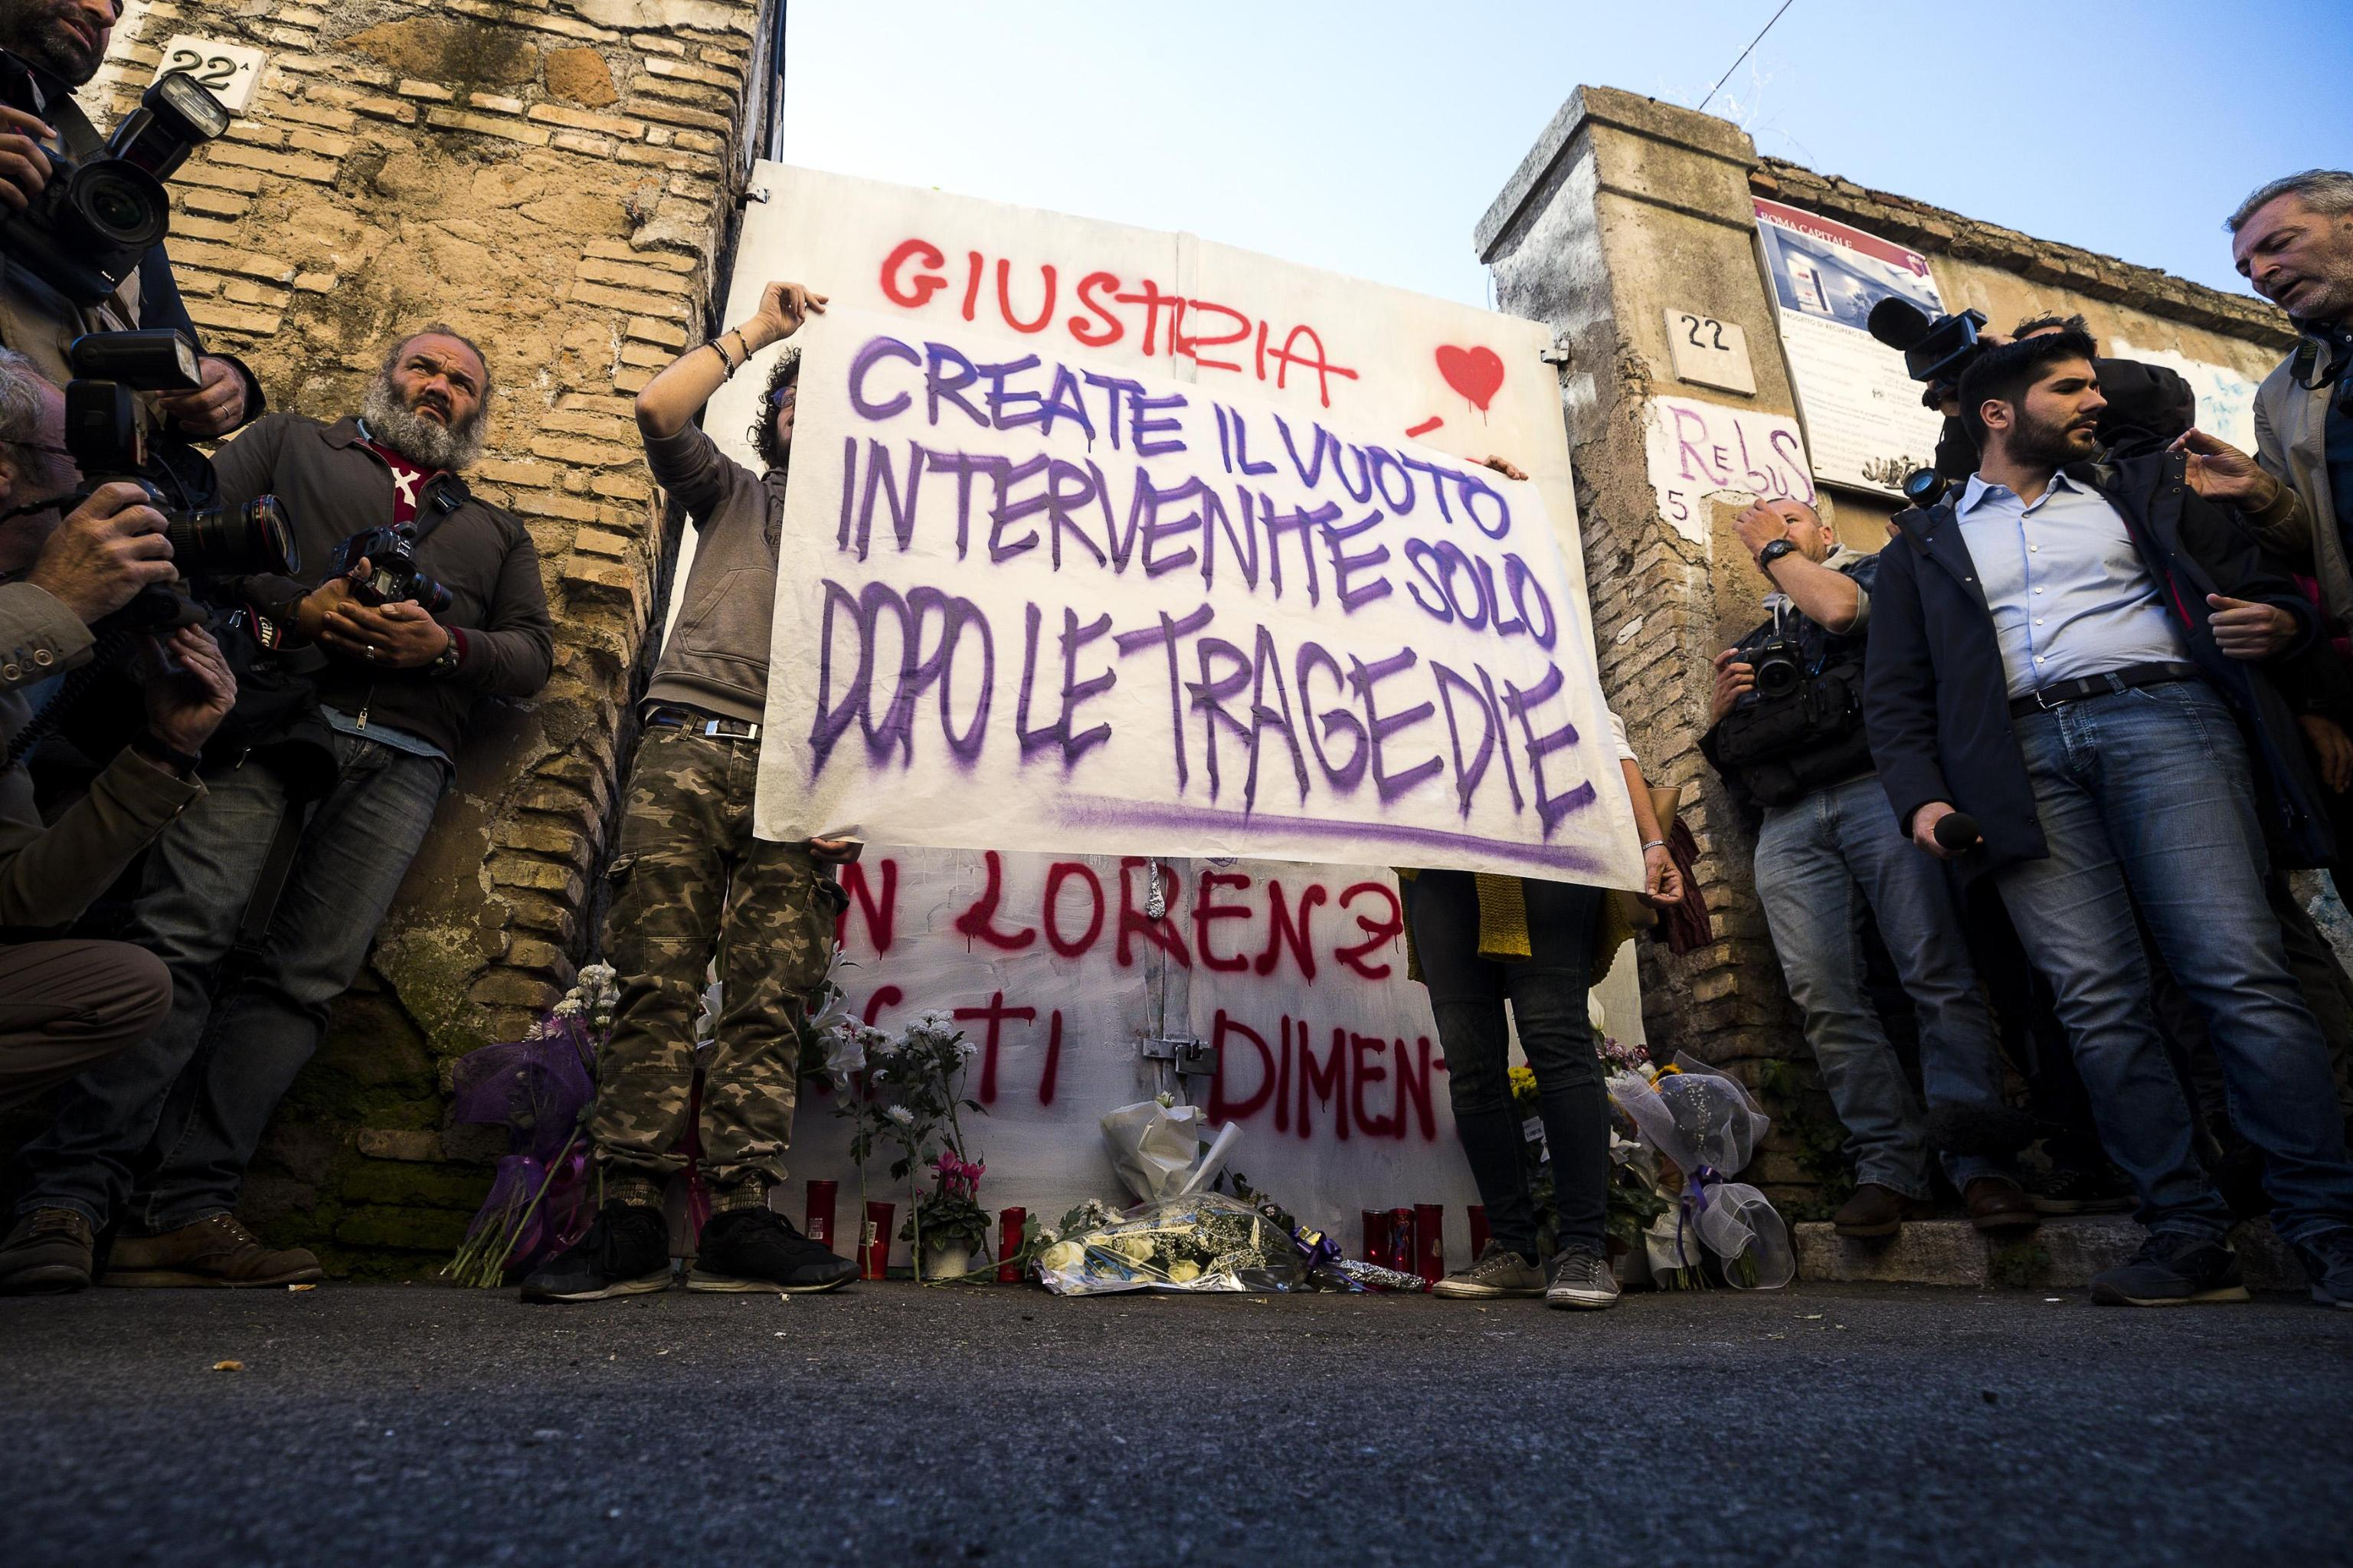 Desirée Mariottini: l'amica divorata dal senso di colpa 'potevo salvarla'